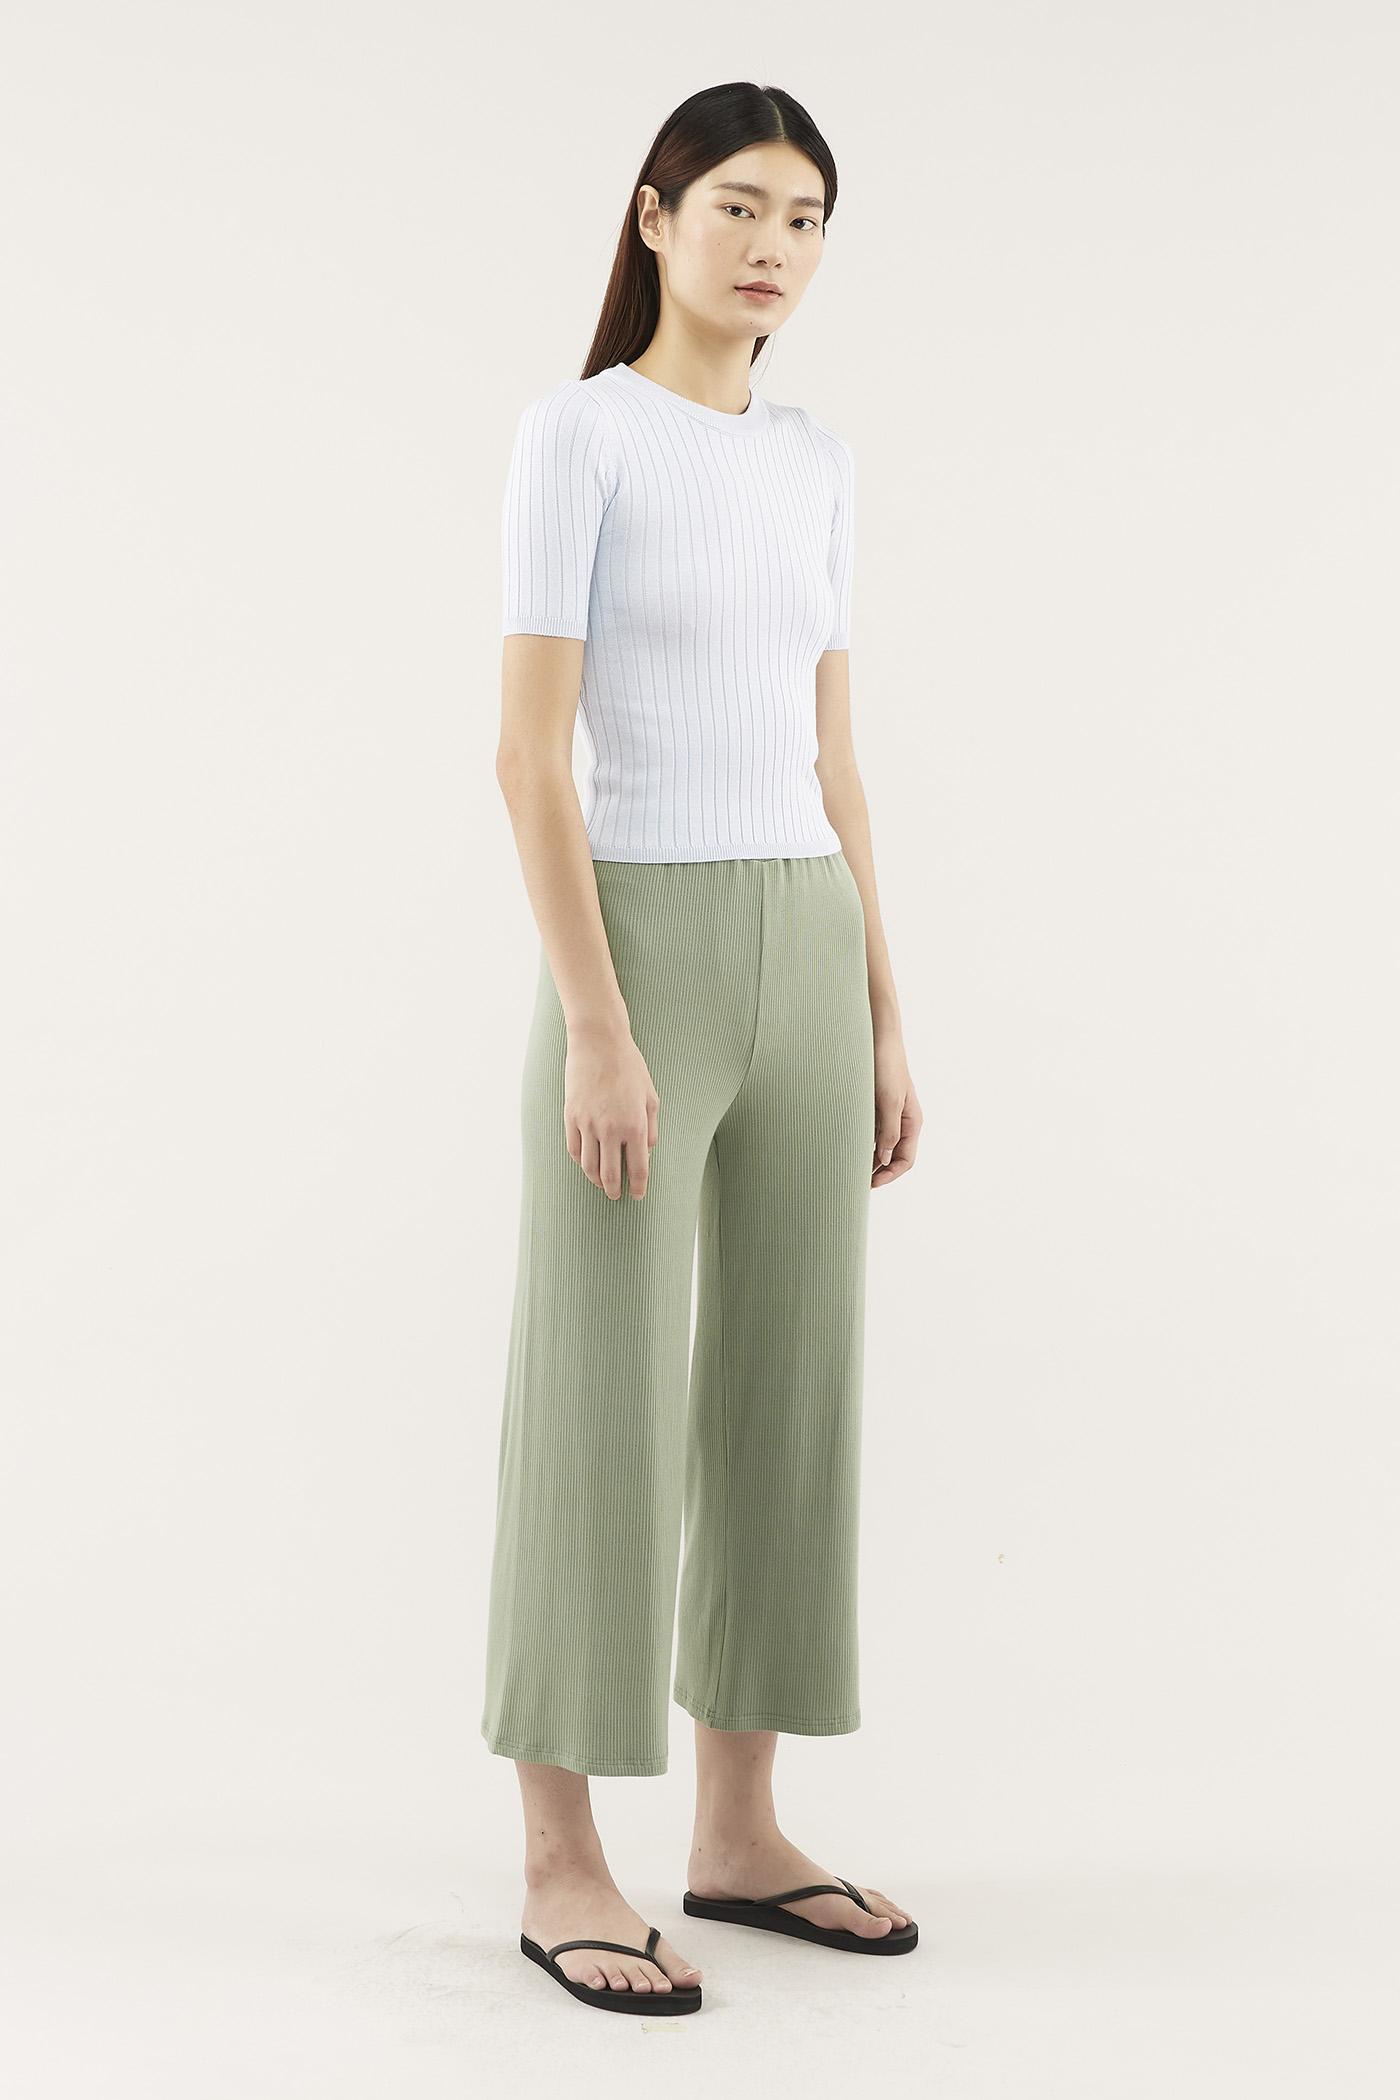 Laina Knit Blouse